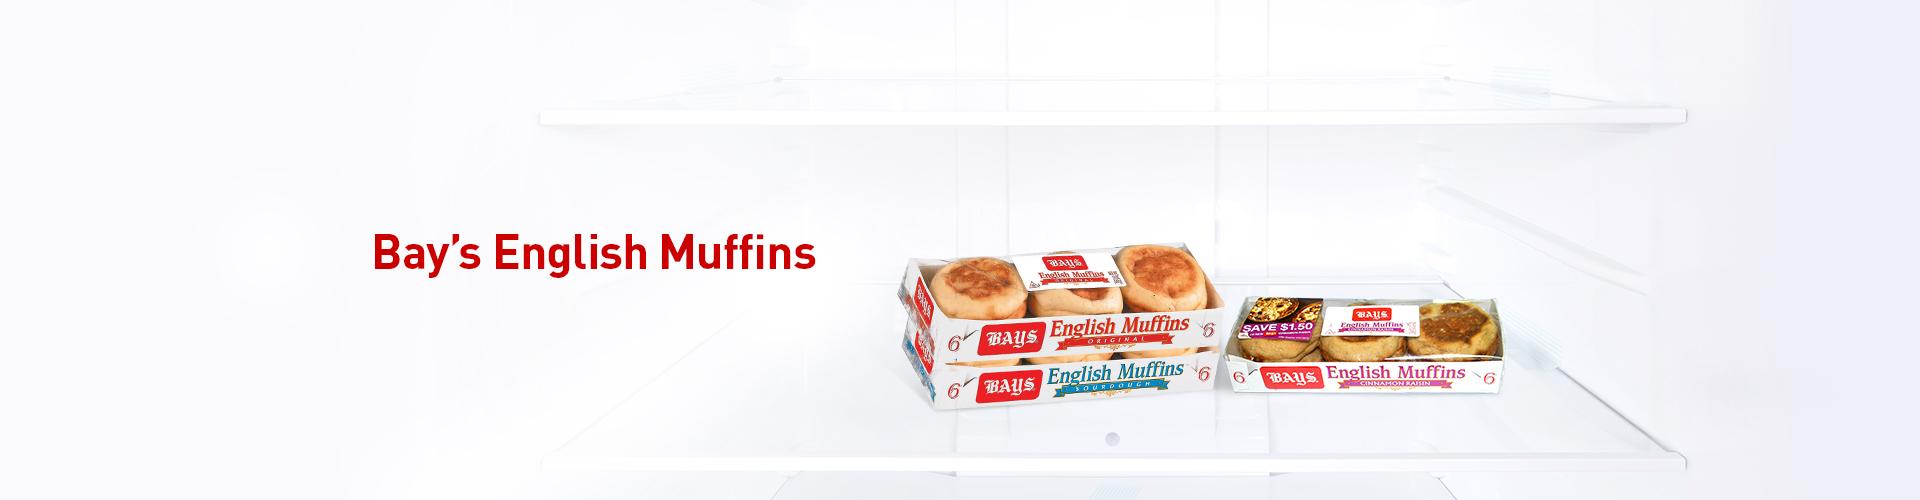 Bay's English Muffins